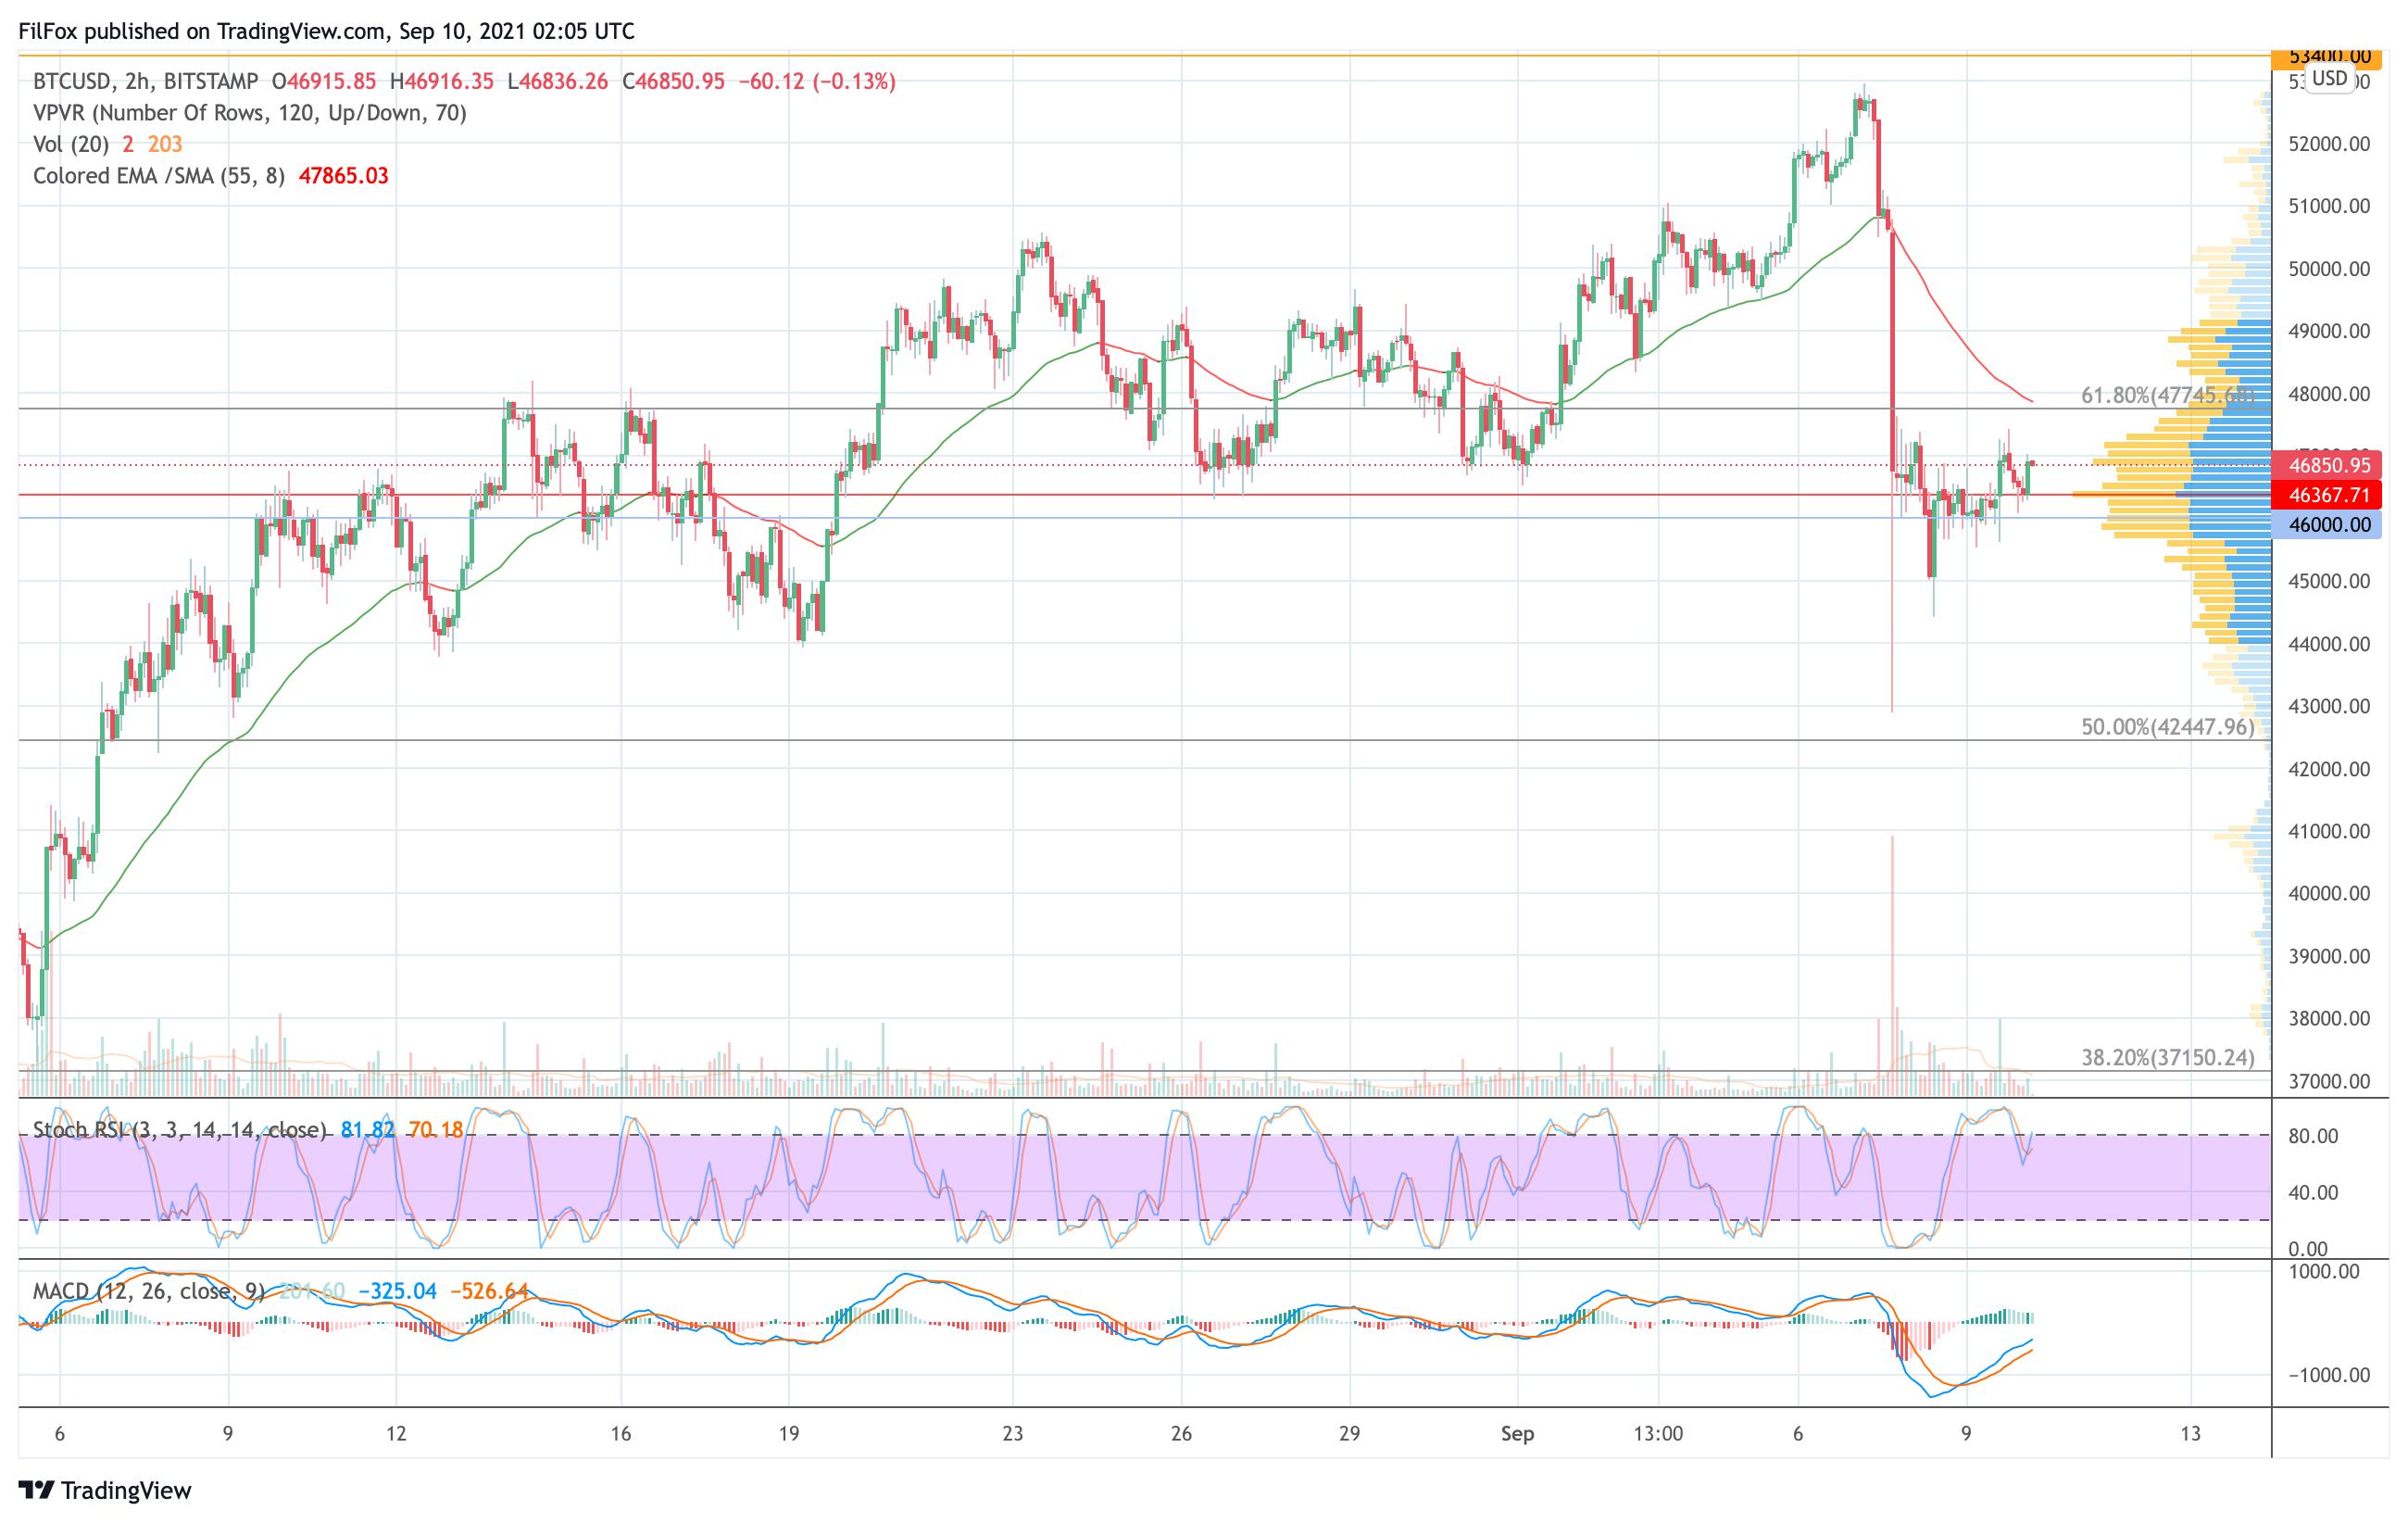 Анализ цен Bitcoin, Ethereum, XRP на 10.09.2021